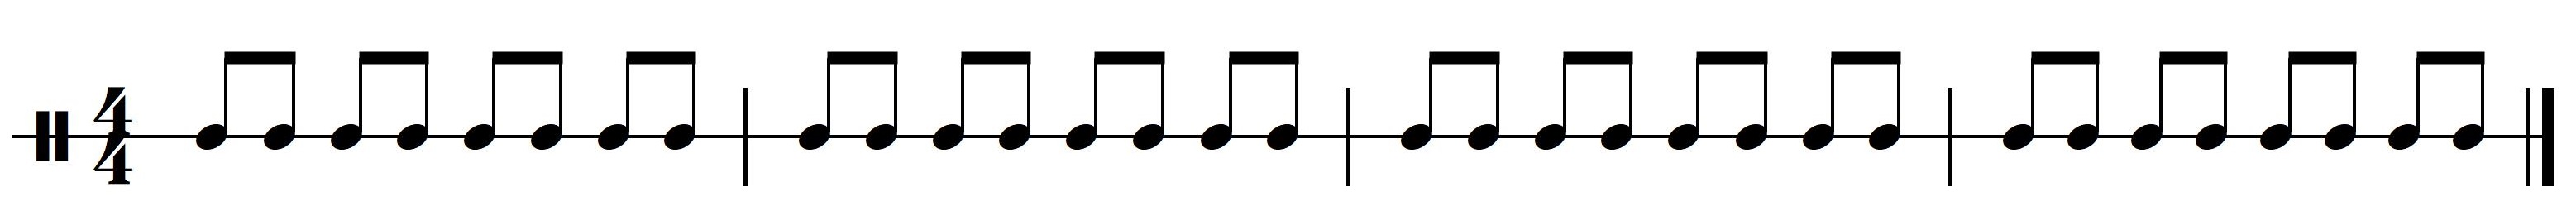 Ritme 1a. Basisritme 1 uit meespeelpartituur Dance Monkey